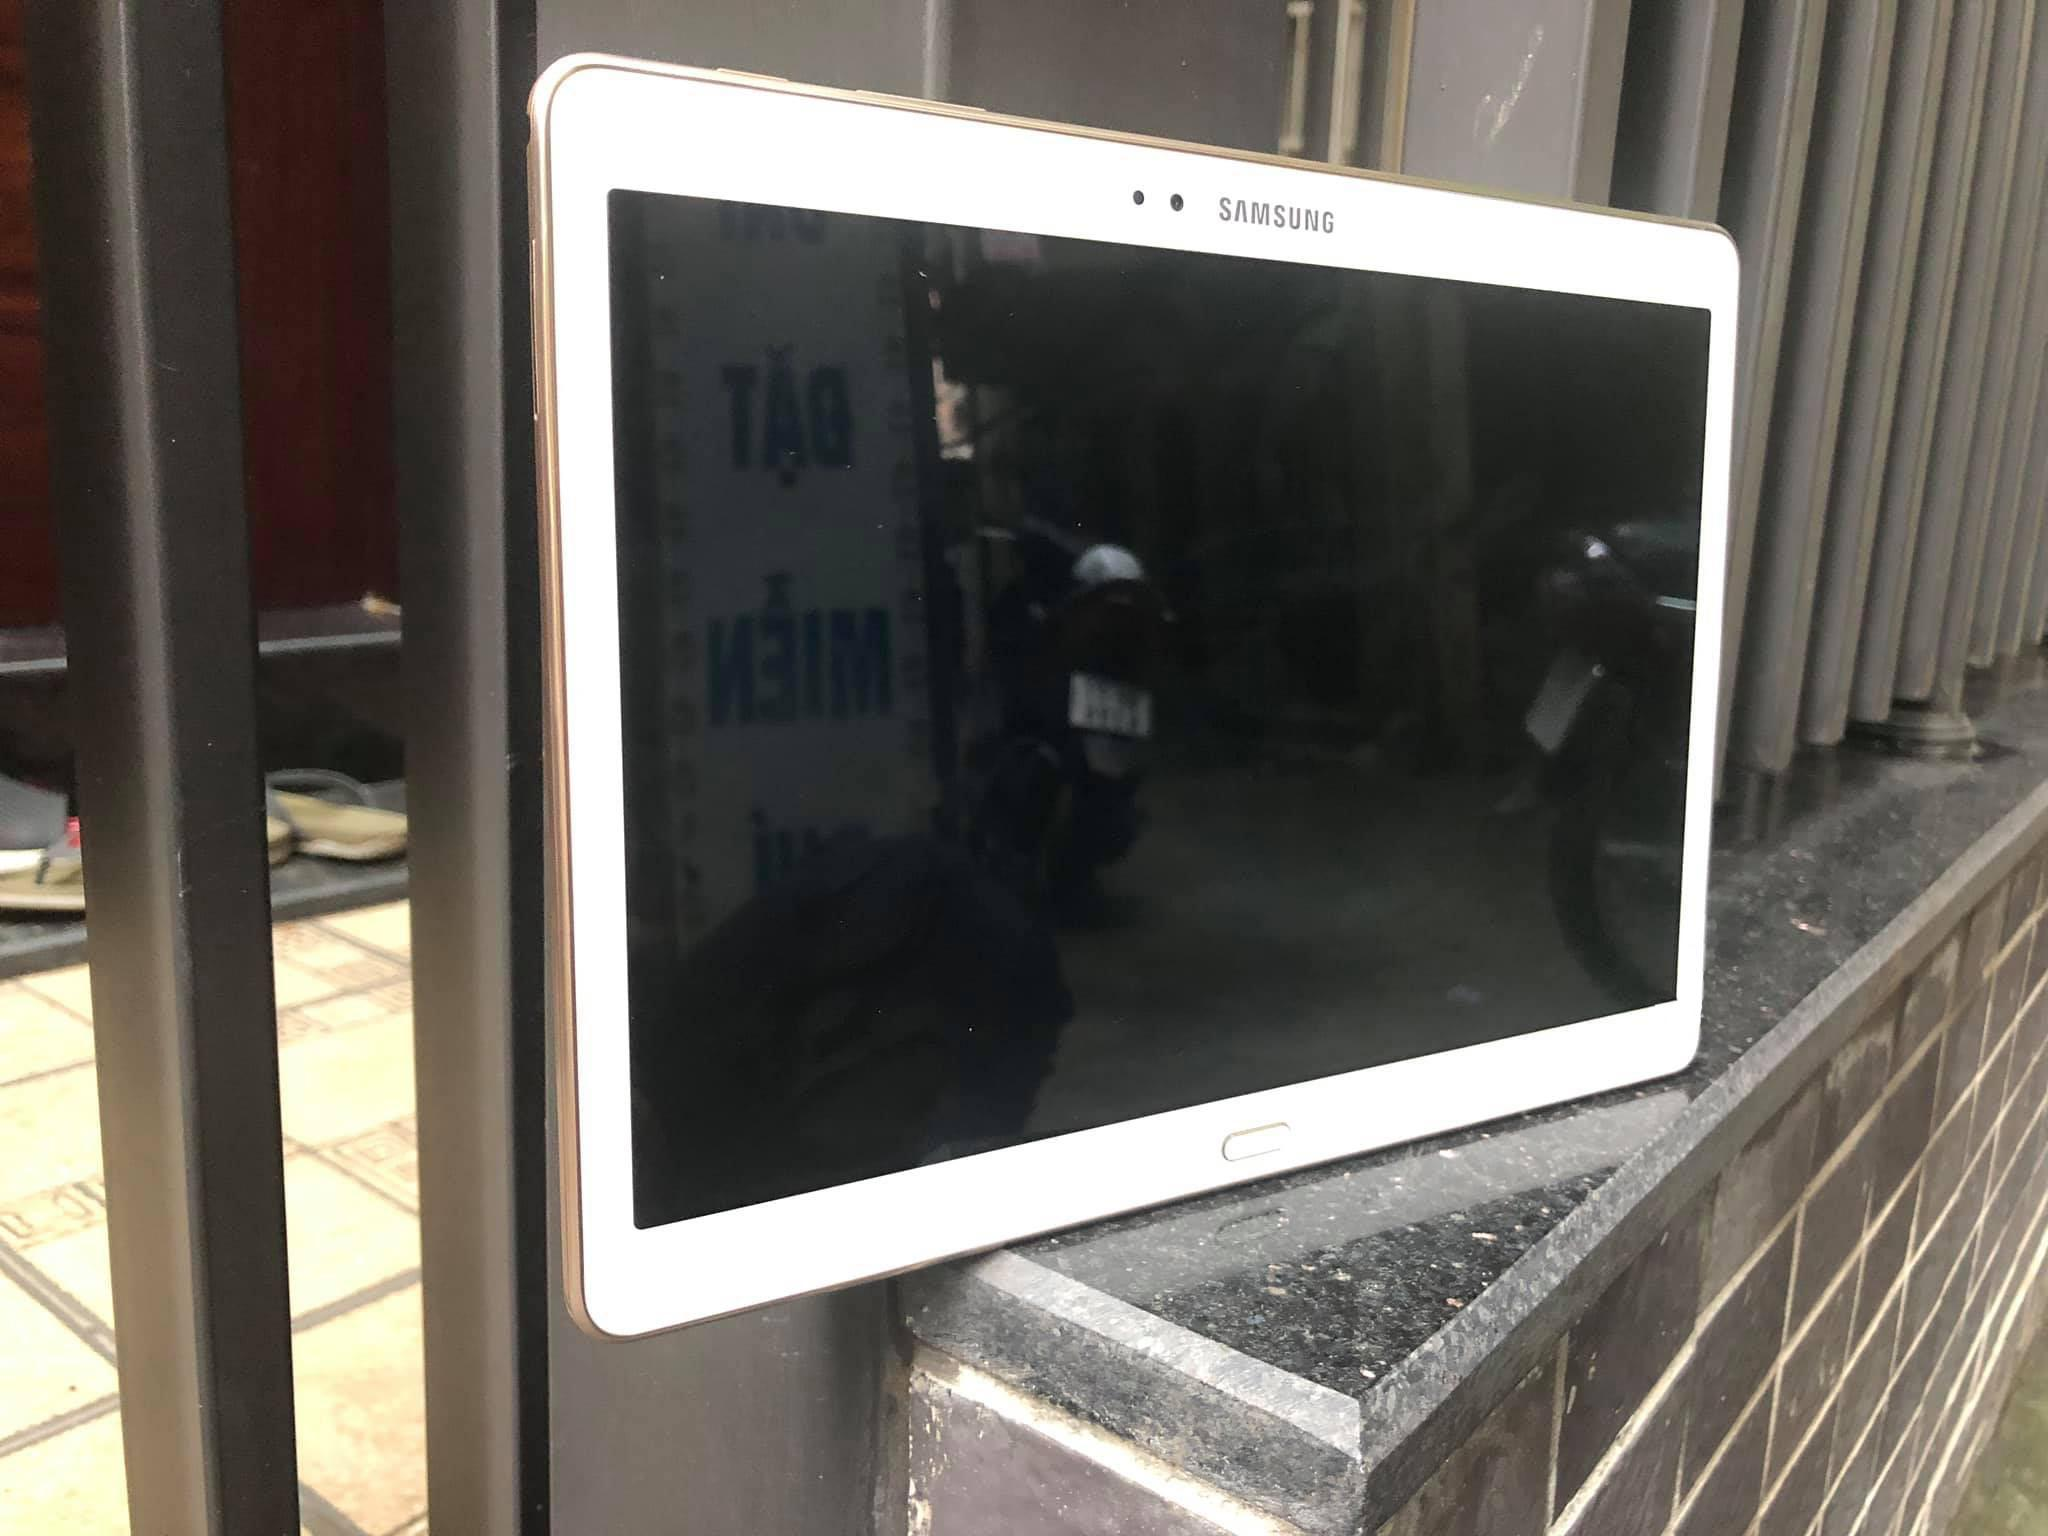 Samsung Galaxy Tab S 10.5 T805